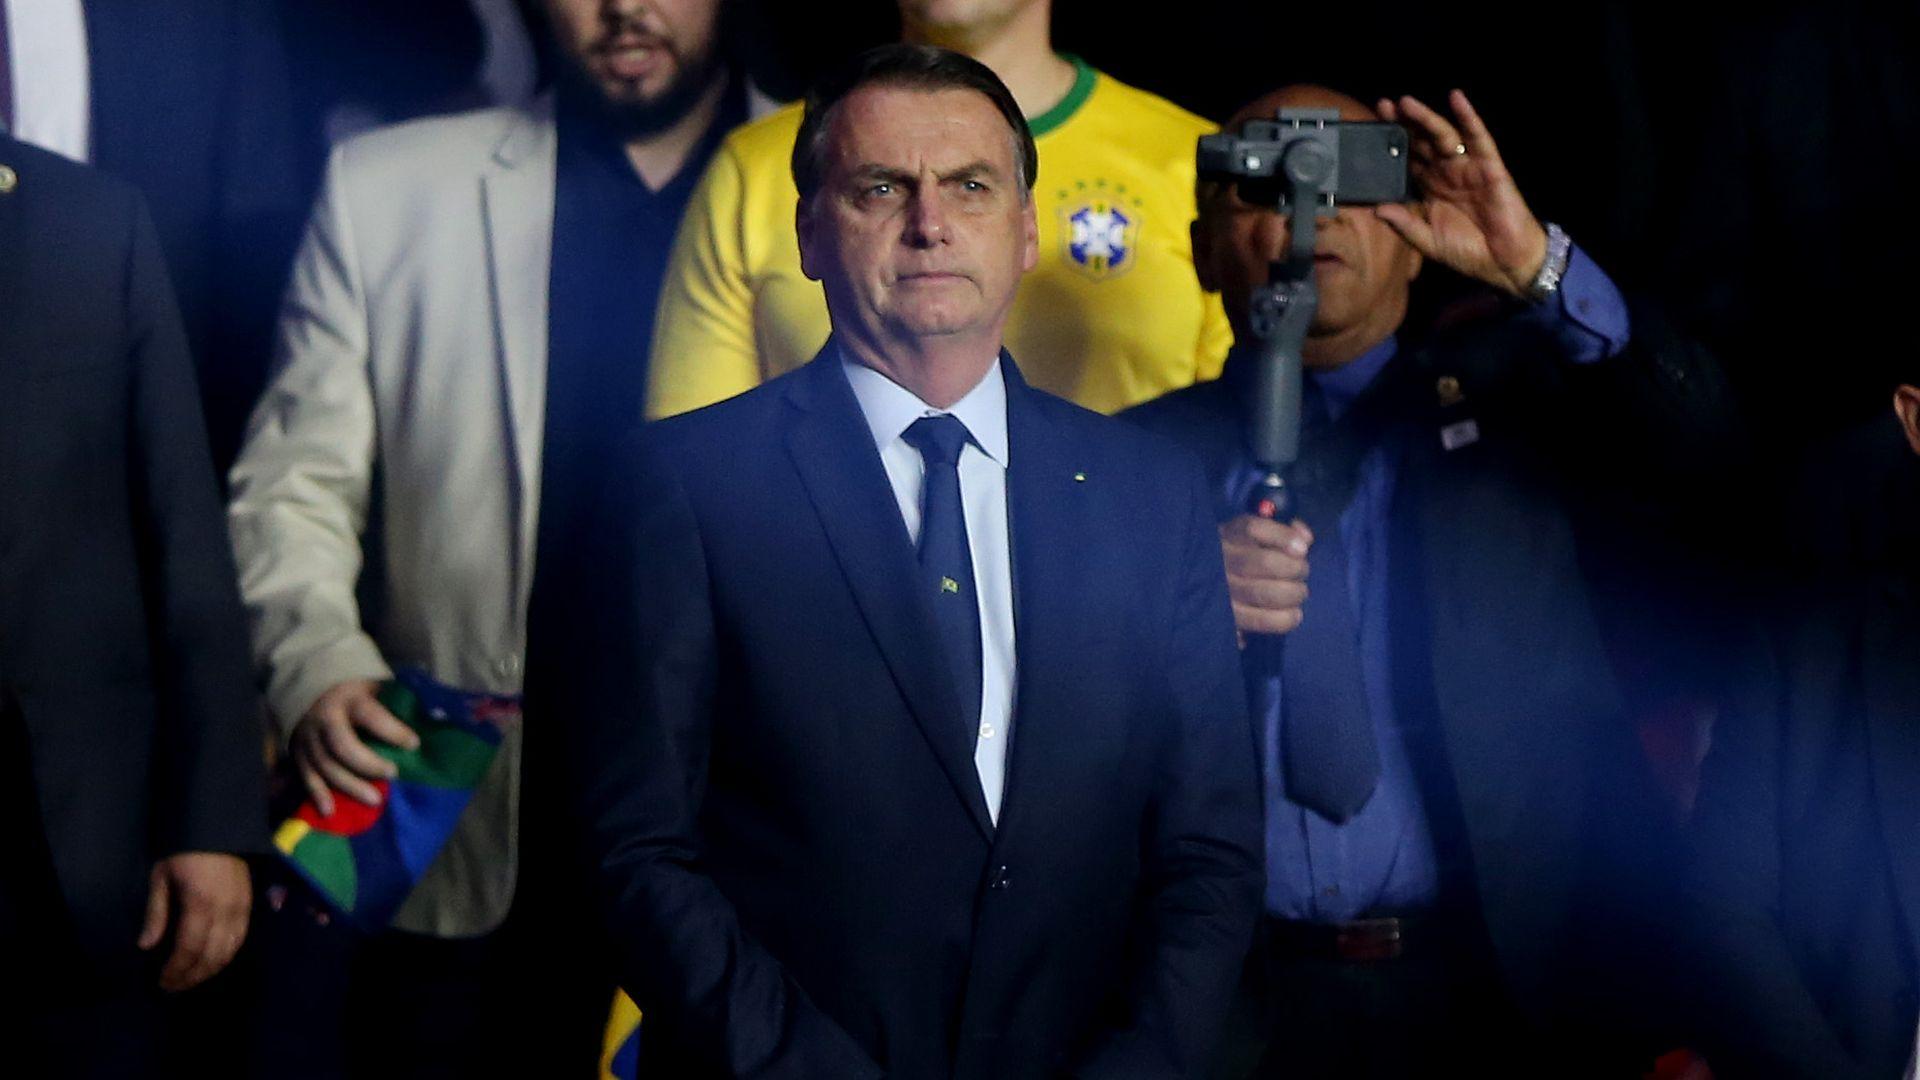 President of Brazil Jair Bolsonaro looks on during the Copa America Brazil 2019 Opening Ceremony on June 14, 2019 in Sao Paulo, Brazil.